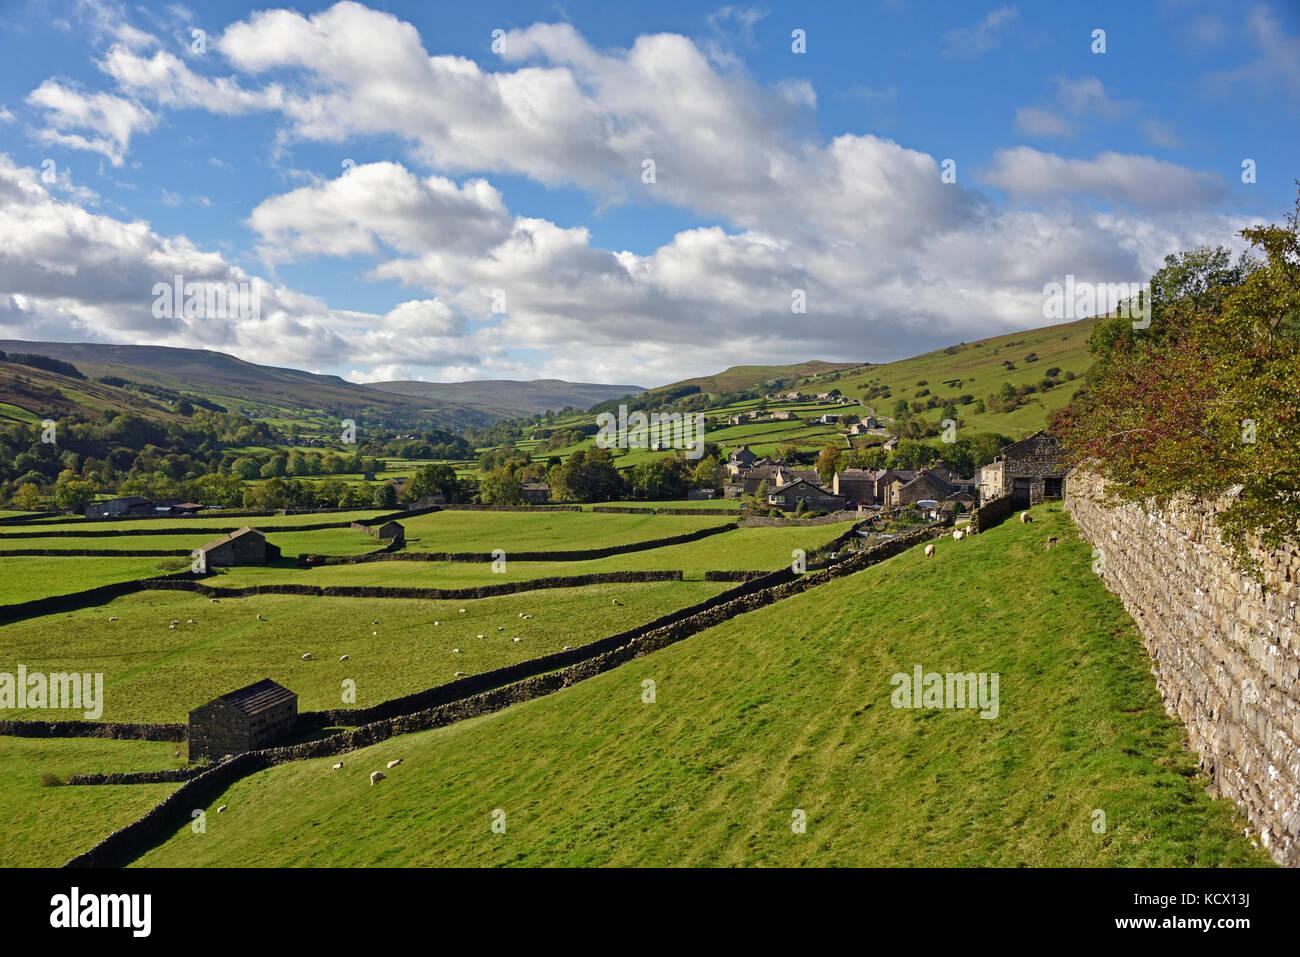 the-village-of-gunnerside-swaledale-richmondshire-north-yorkshire-KCX13J.jpg